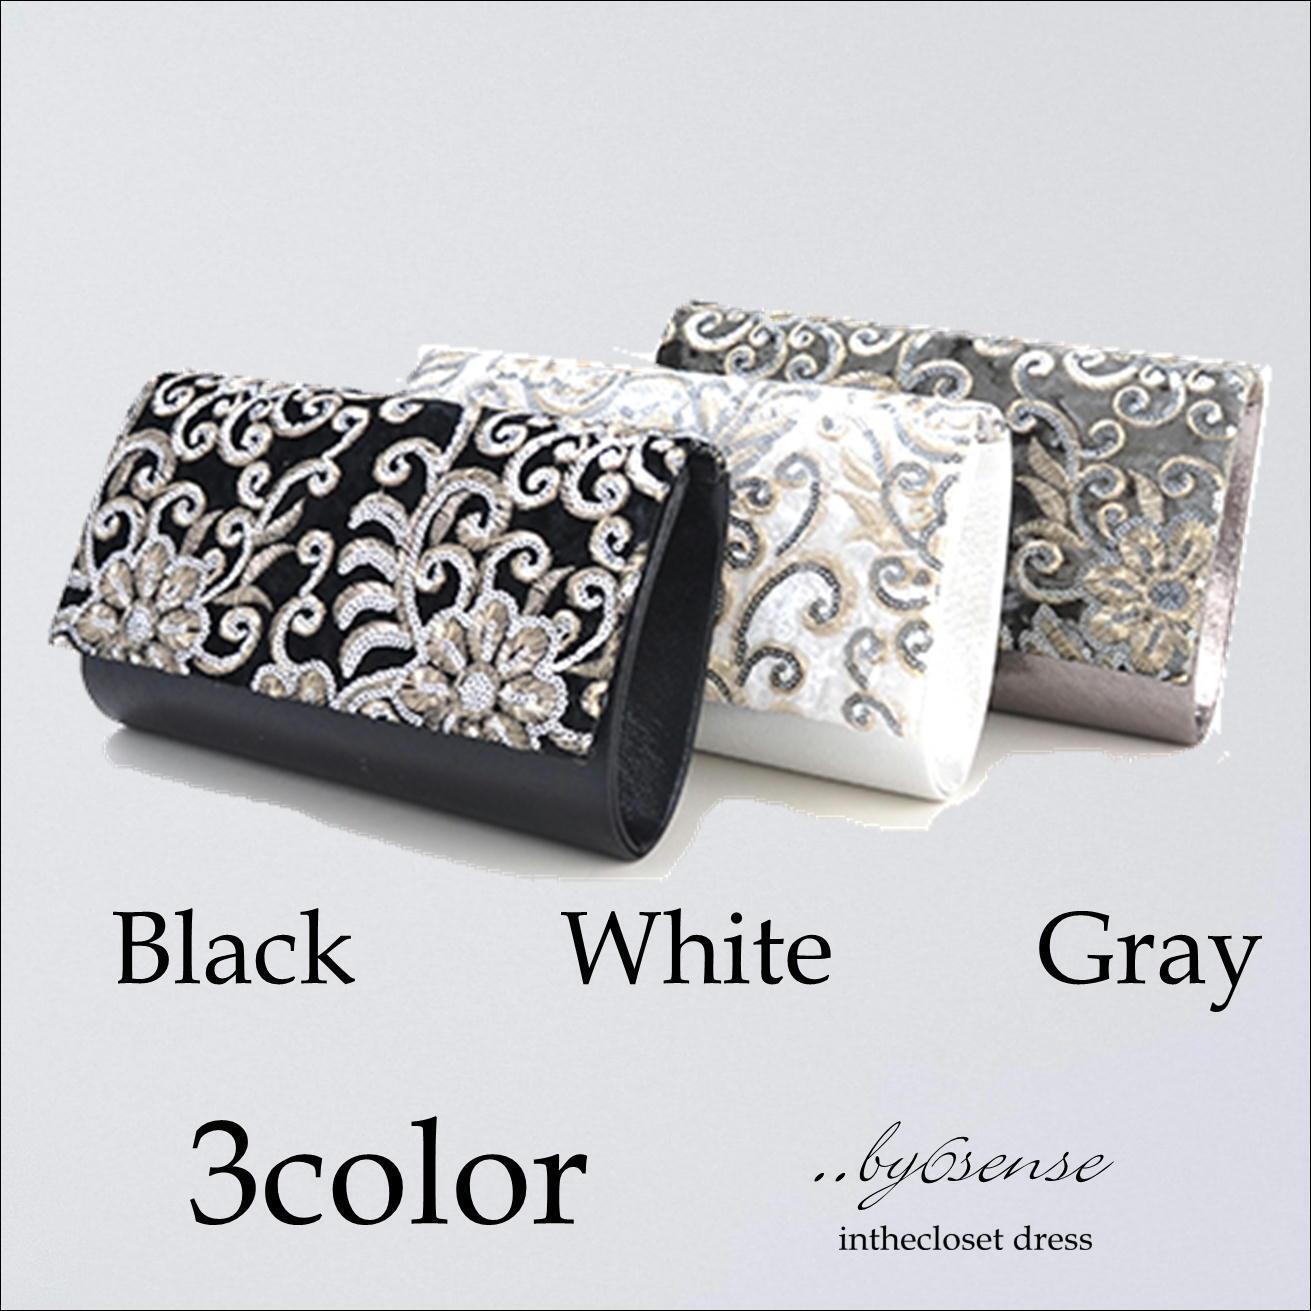 3color ベロア刺繍 パーティバック  浜松ドレスショップ..by6sense